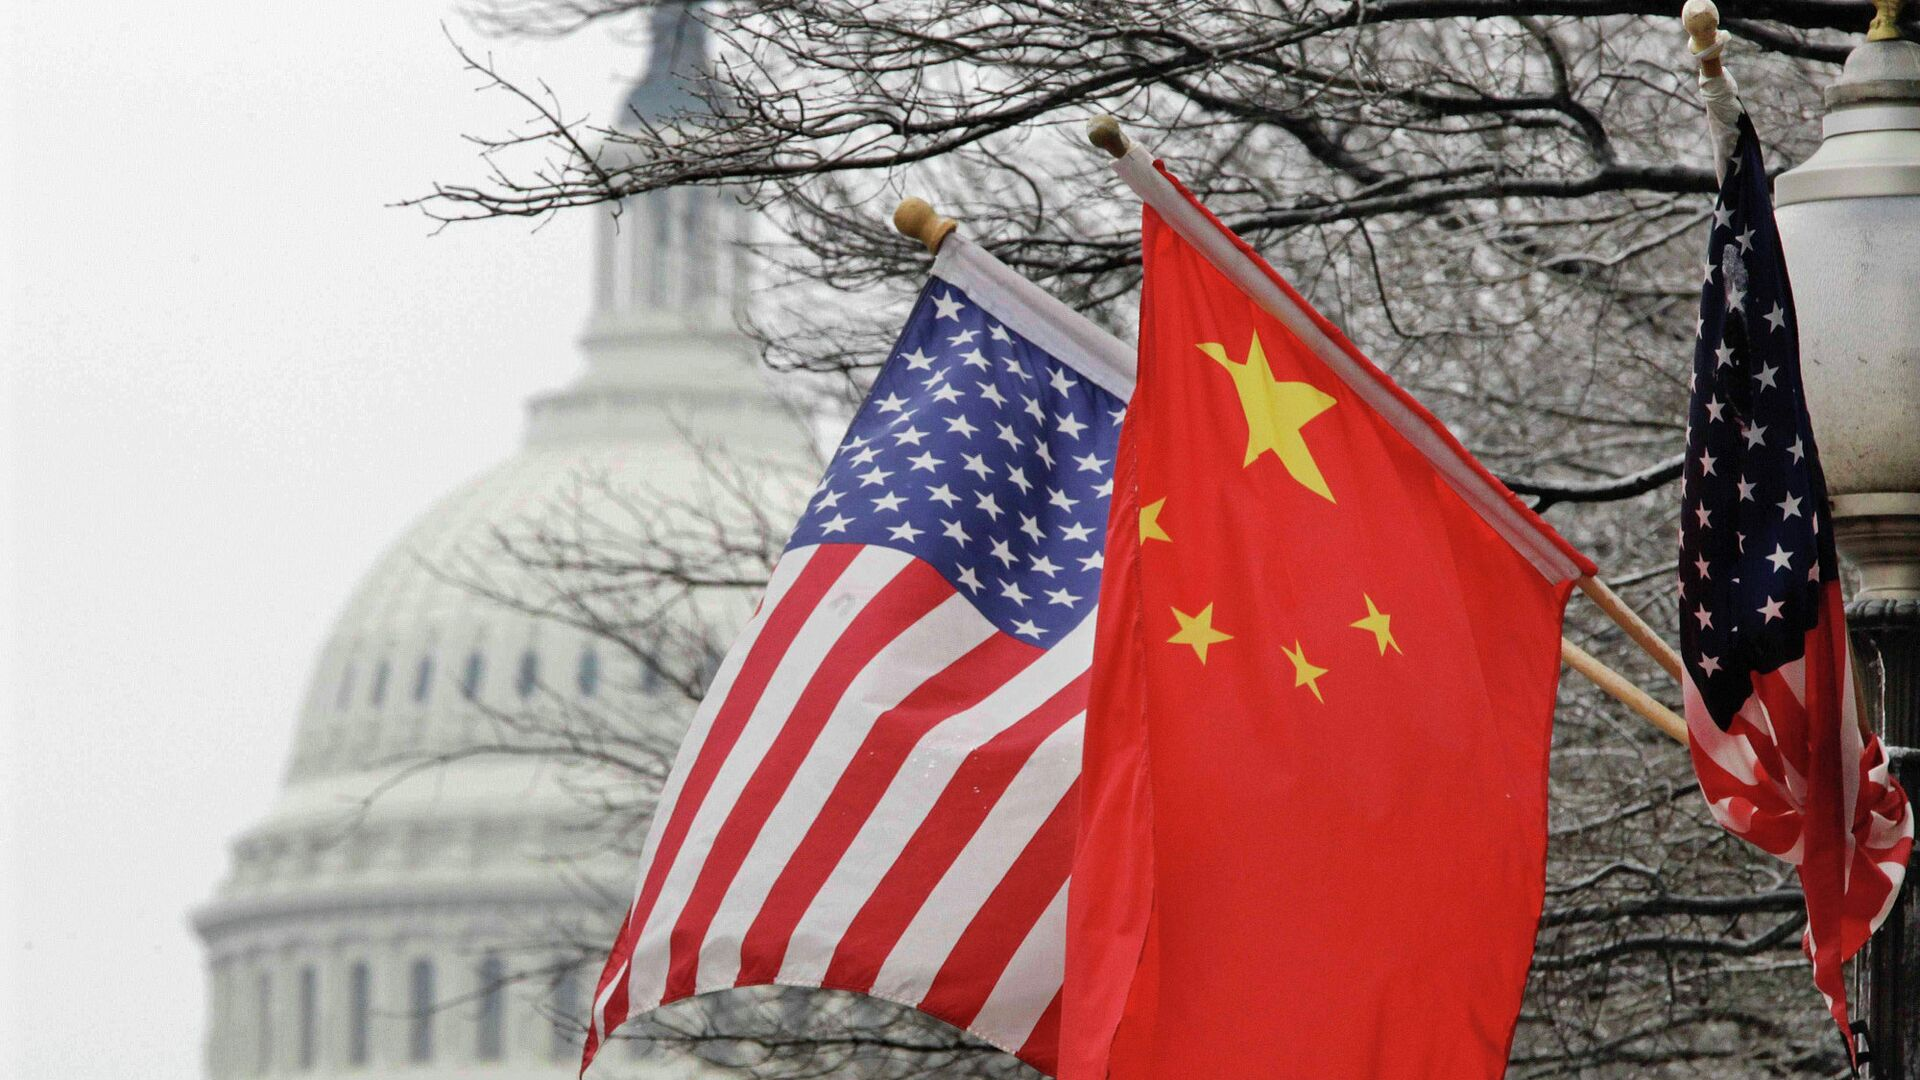 Флаги США и Китая на фоне здания Конгресса США в Вашингтоне - РИА Новости, 1920, 18.06.2020